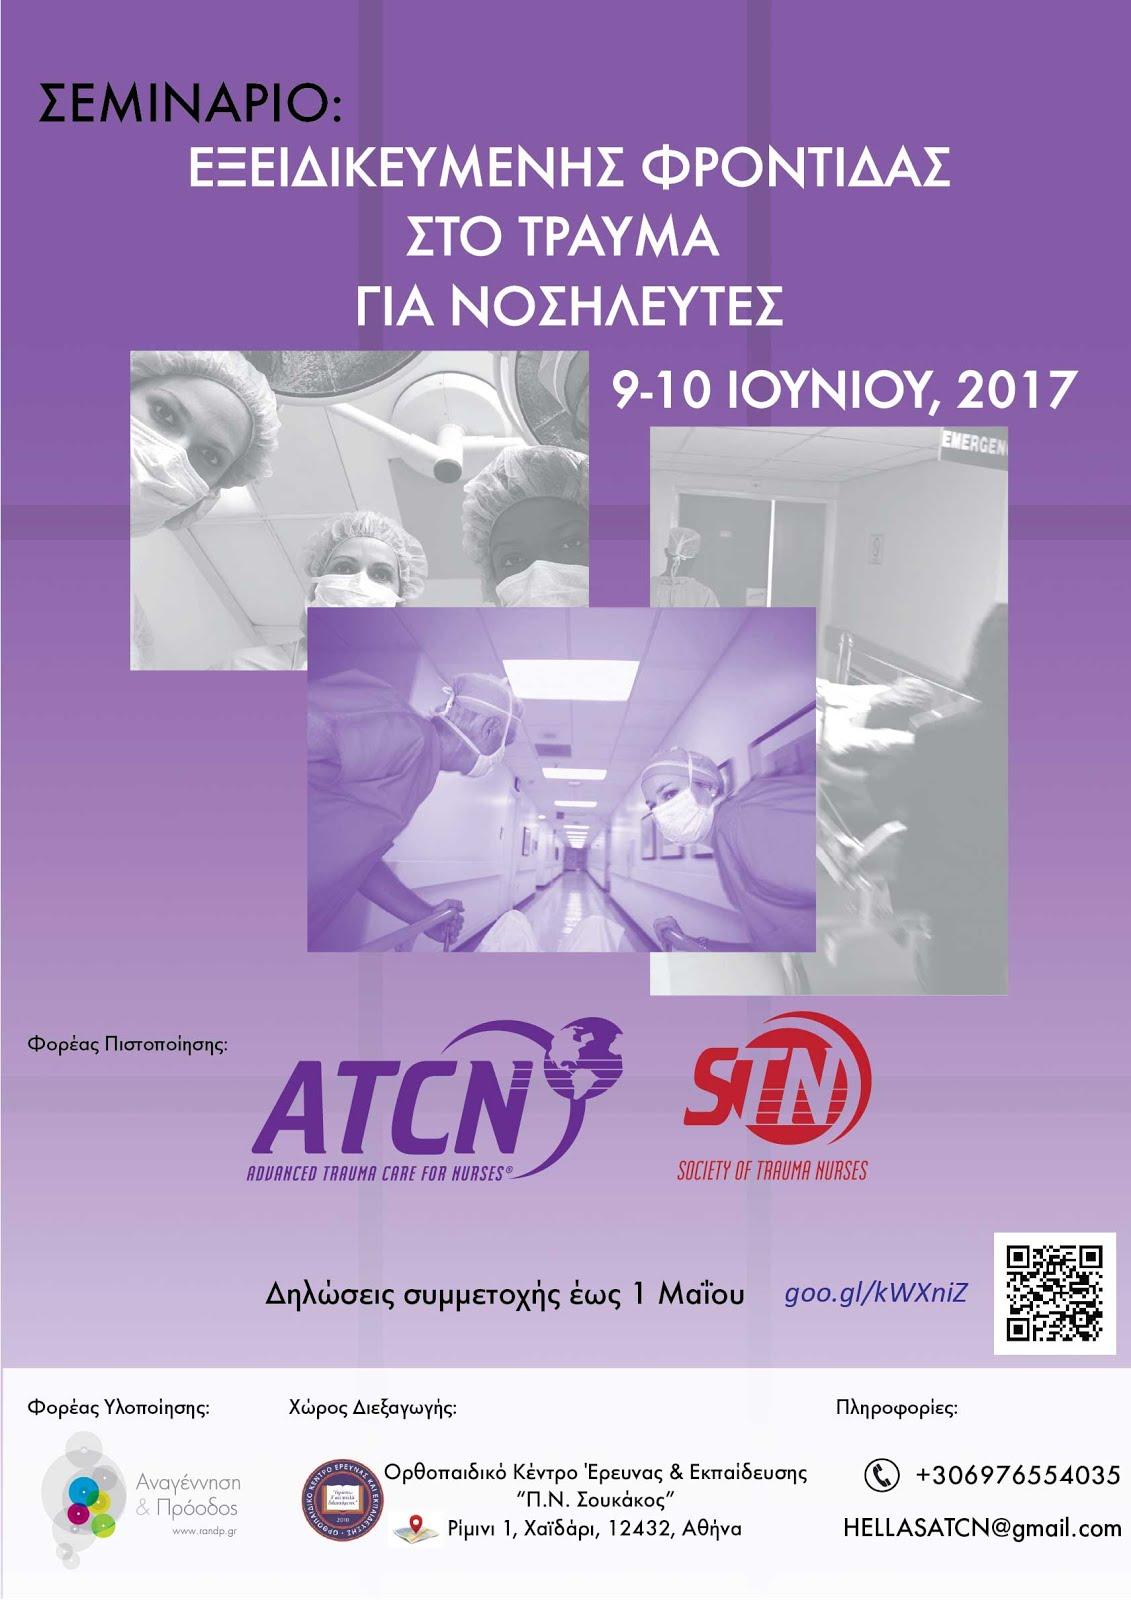 ATCN Course joune 2017